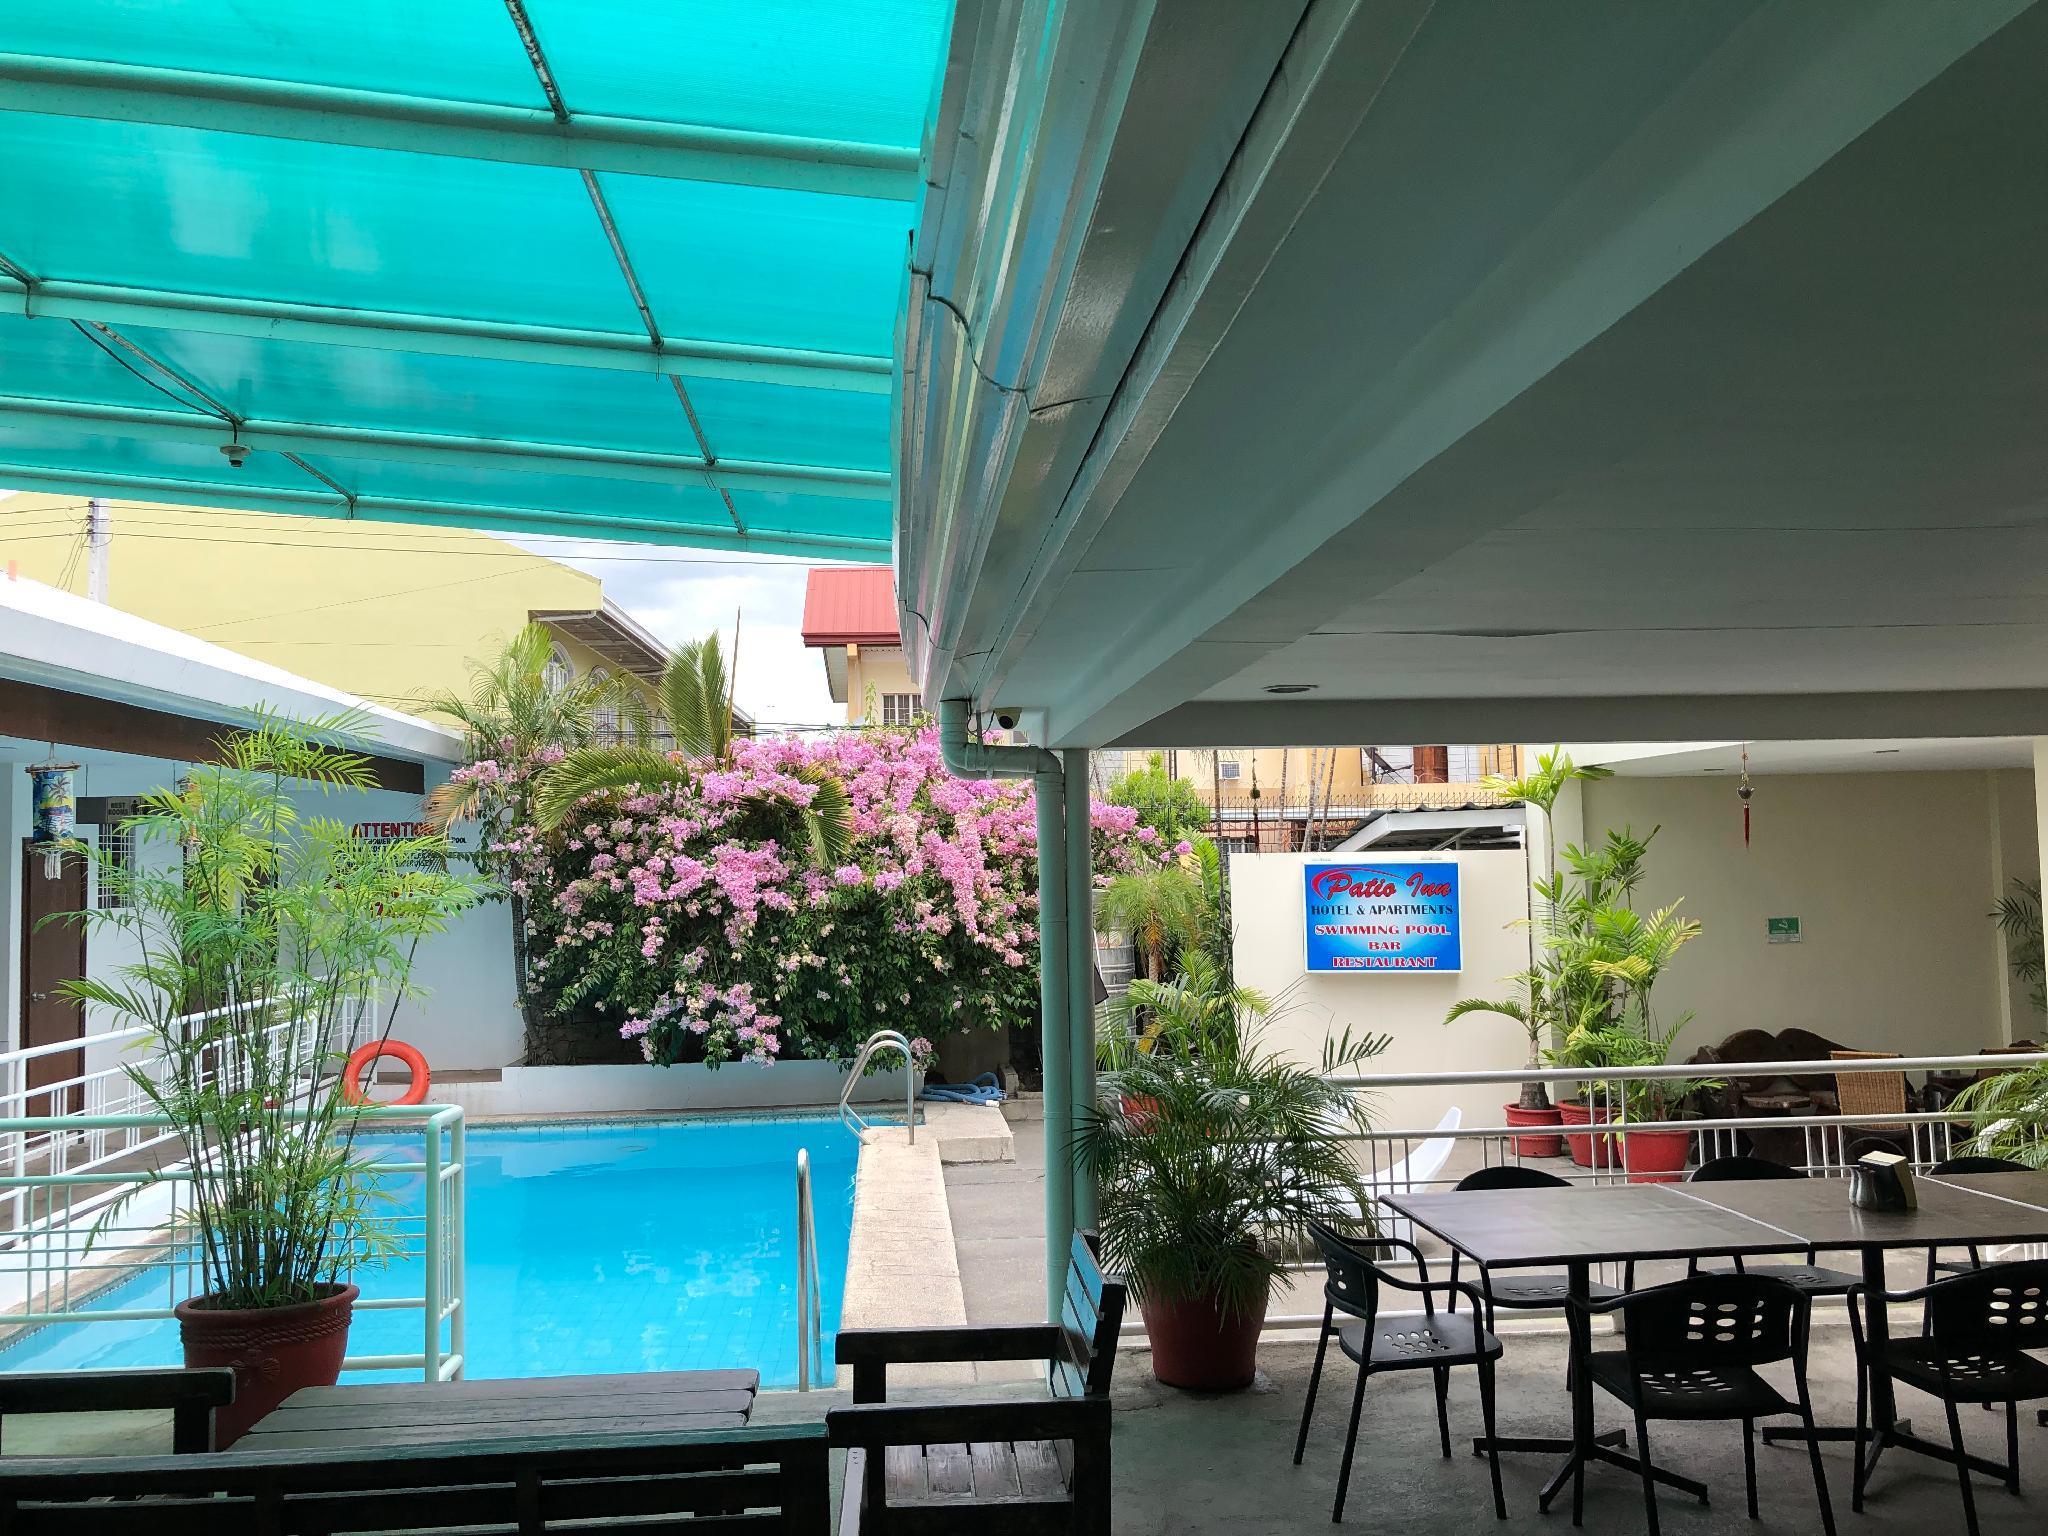 Patio Inn Hotel And Restaurant